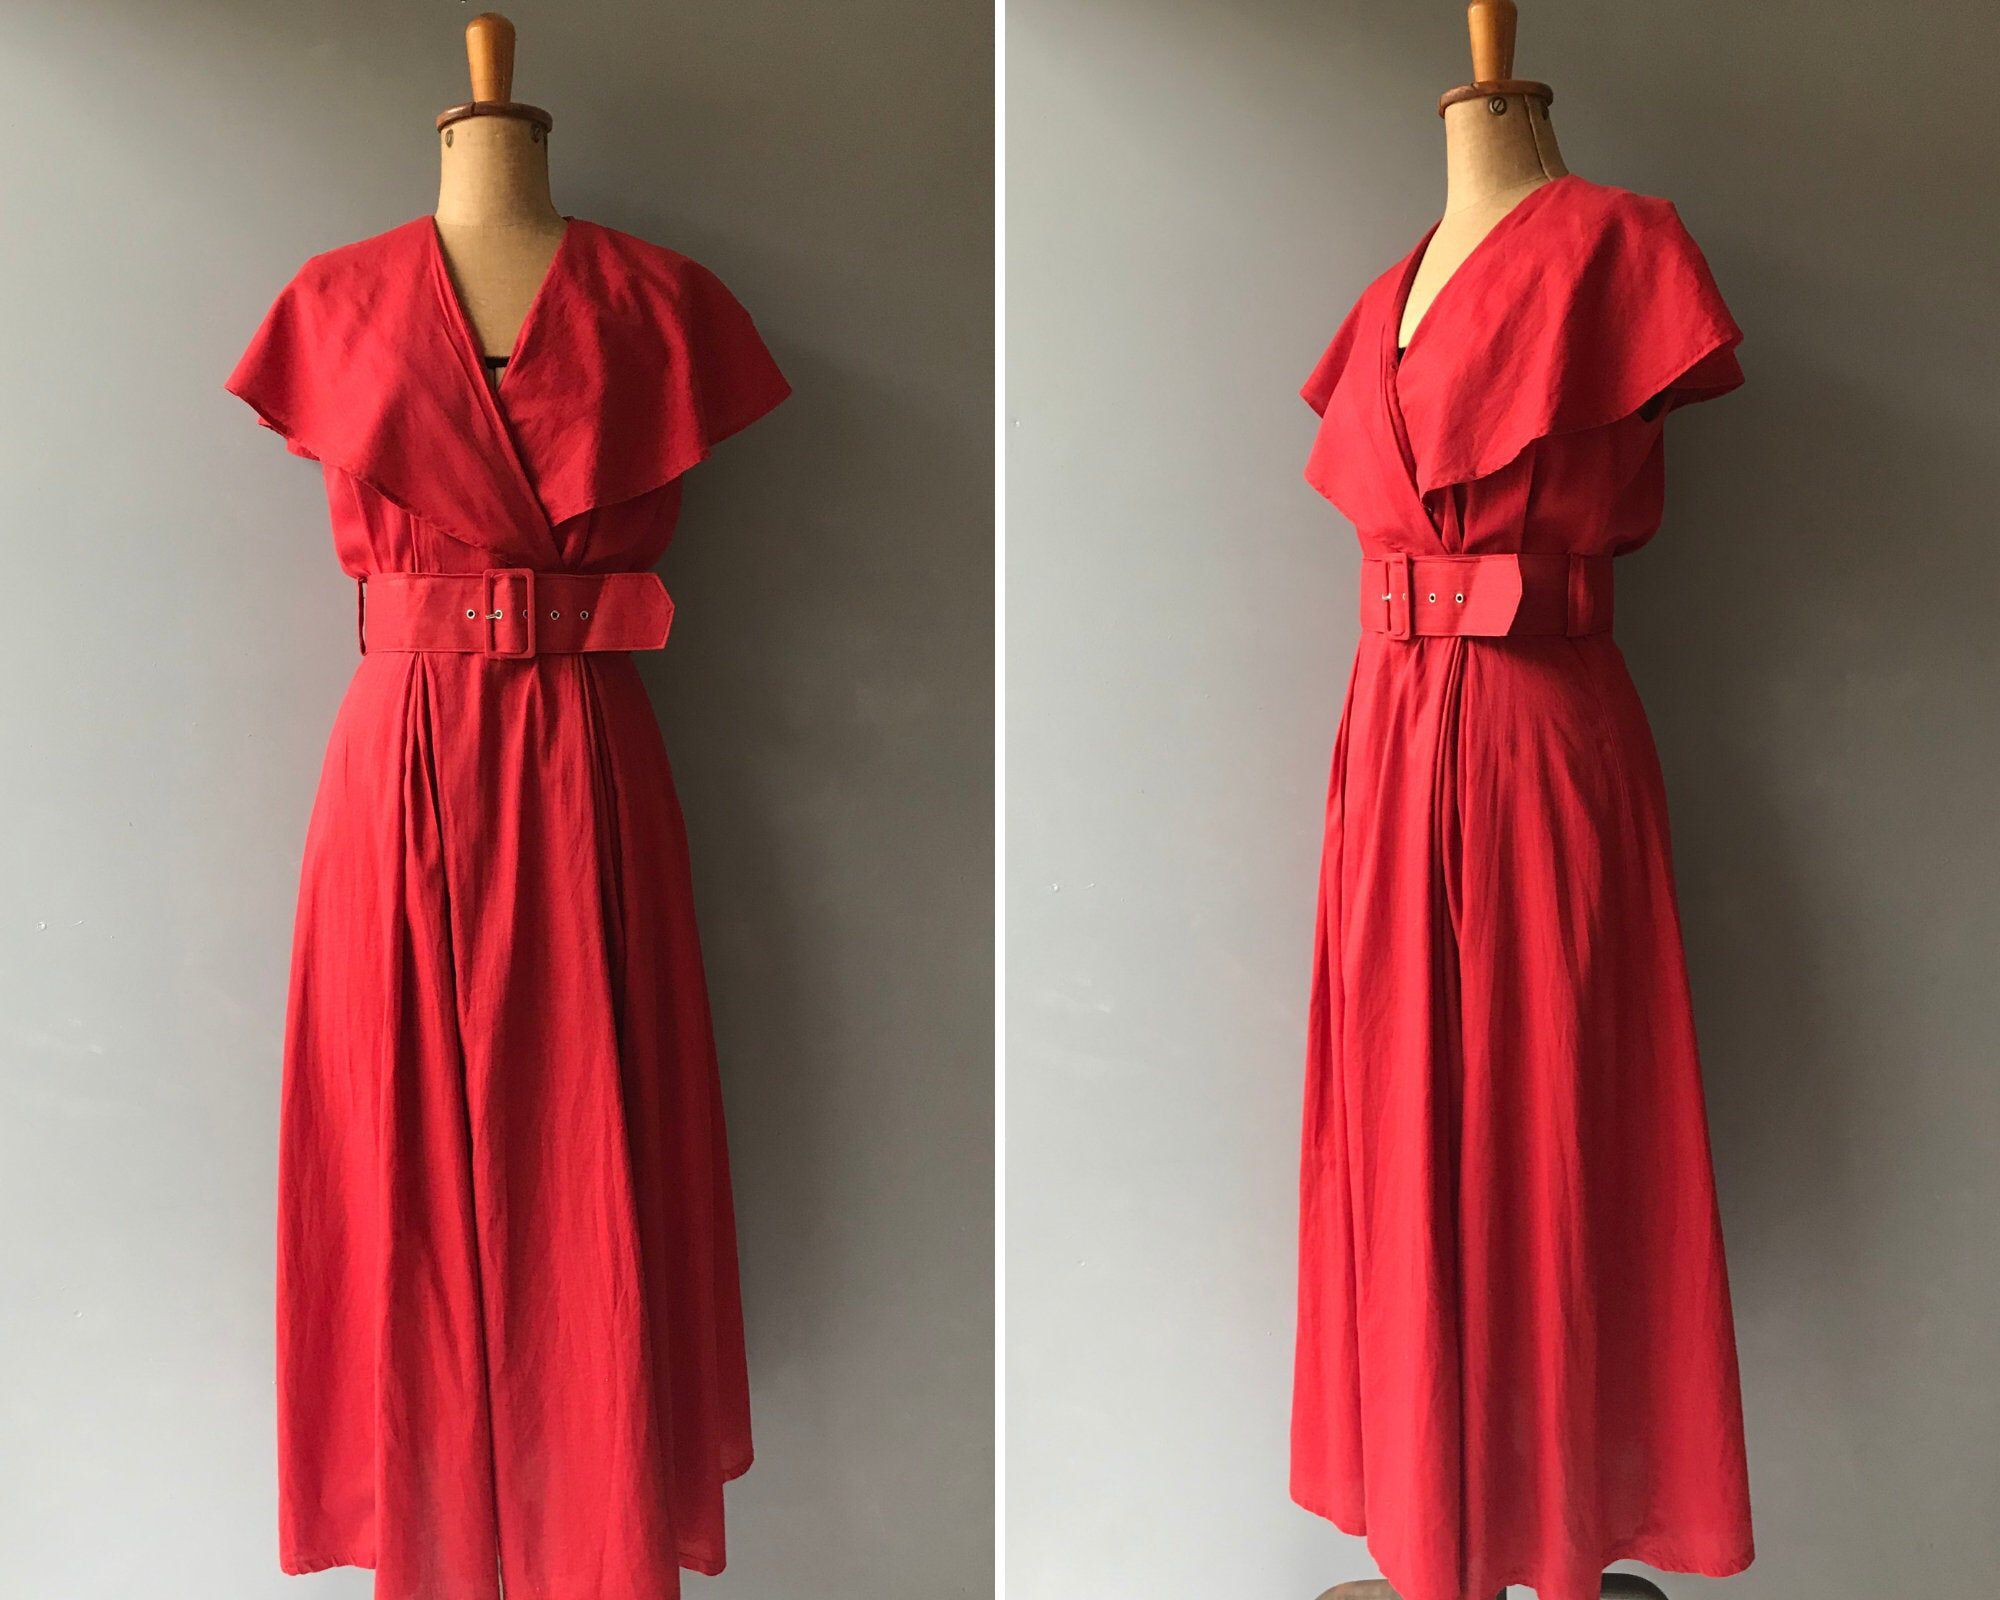 Vintage 80s Red Cotton Dress Romantic Boho Maxi Small Etsy Dresses Vintage Red Dress Boho Maxi Dress [ 1600 x 2000 Pixel ]